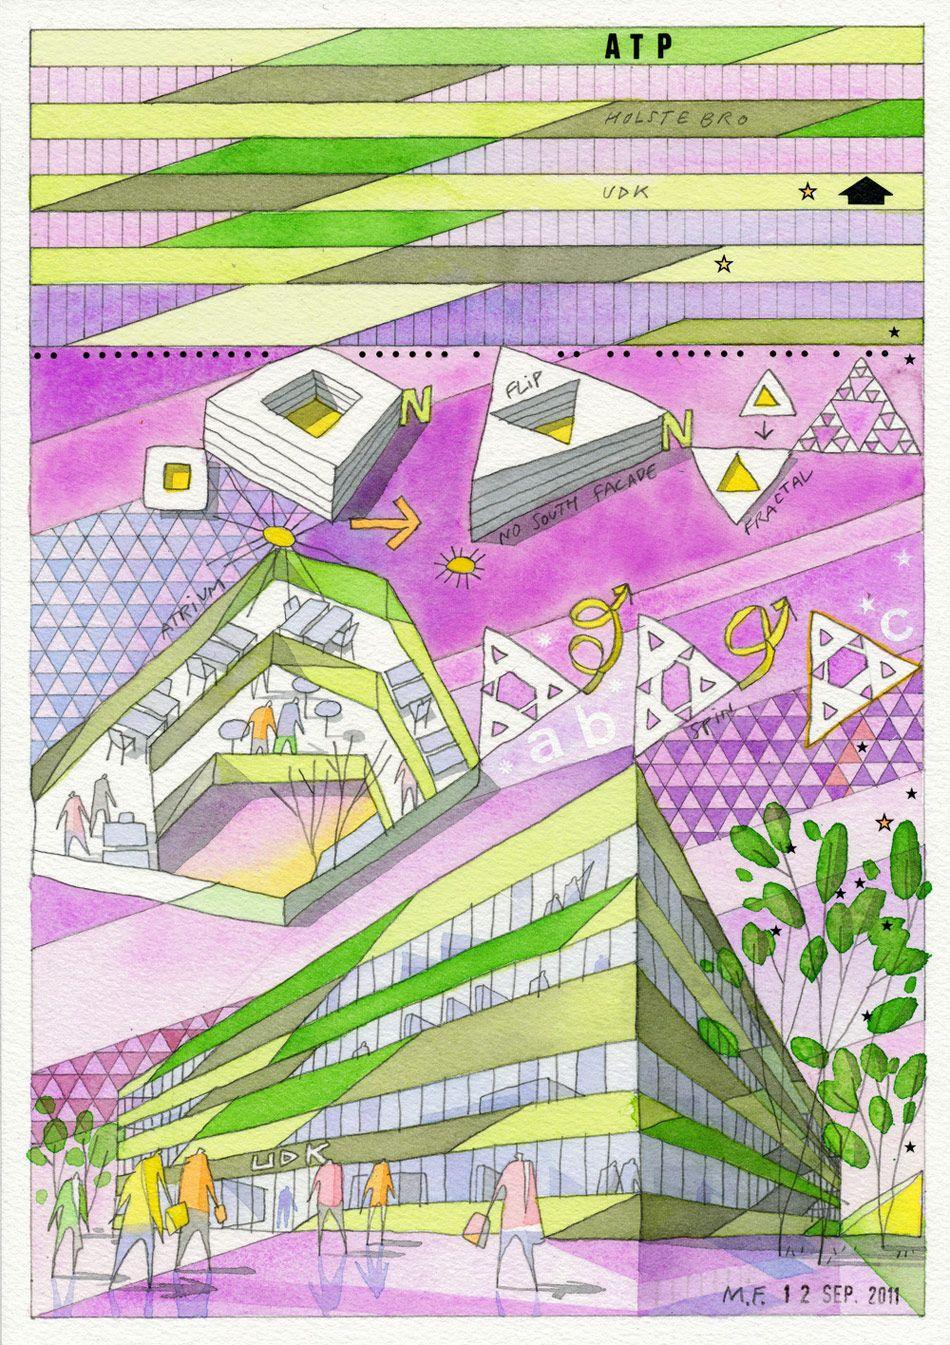 Cebra Udk Holstebro Administration Building Architecture Drawing Architecture Illustration Architecture Sketch